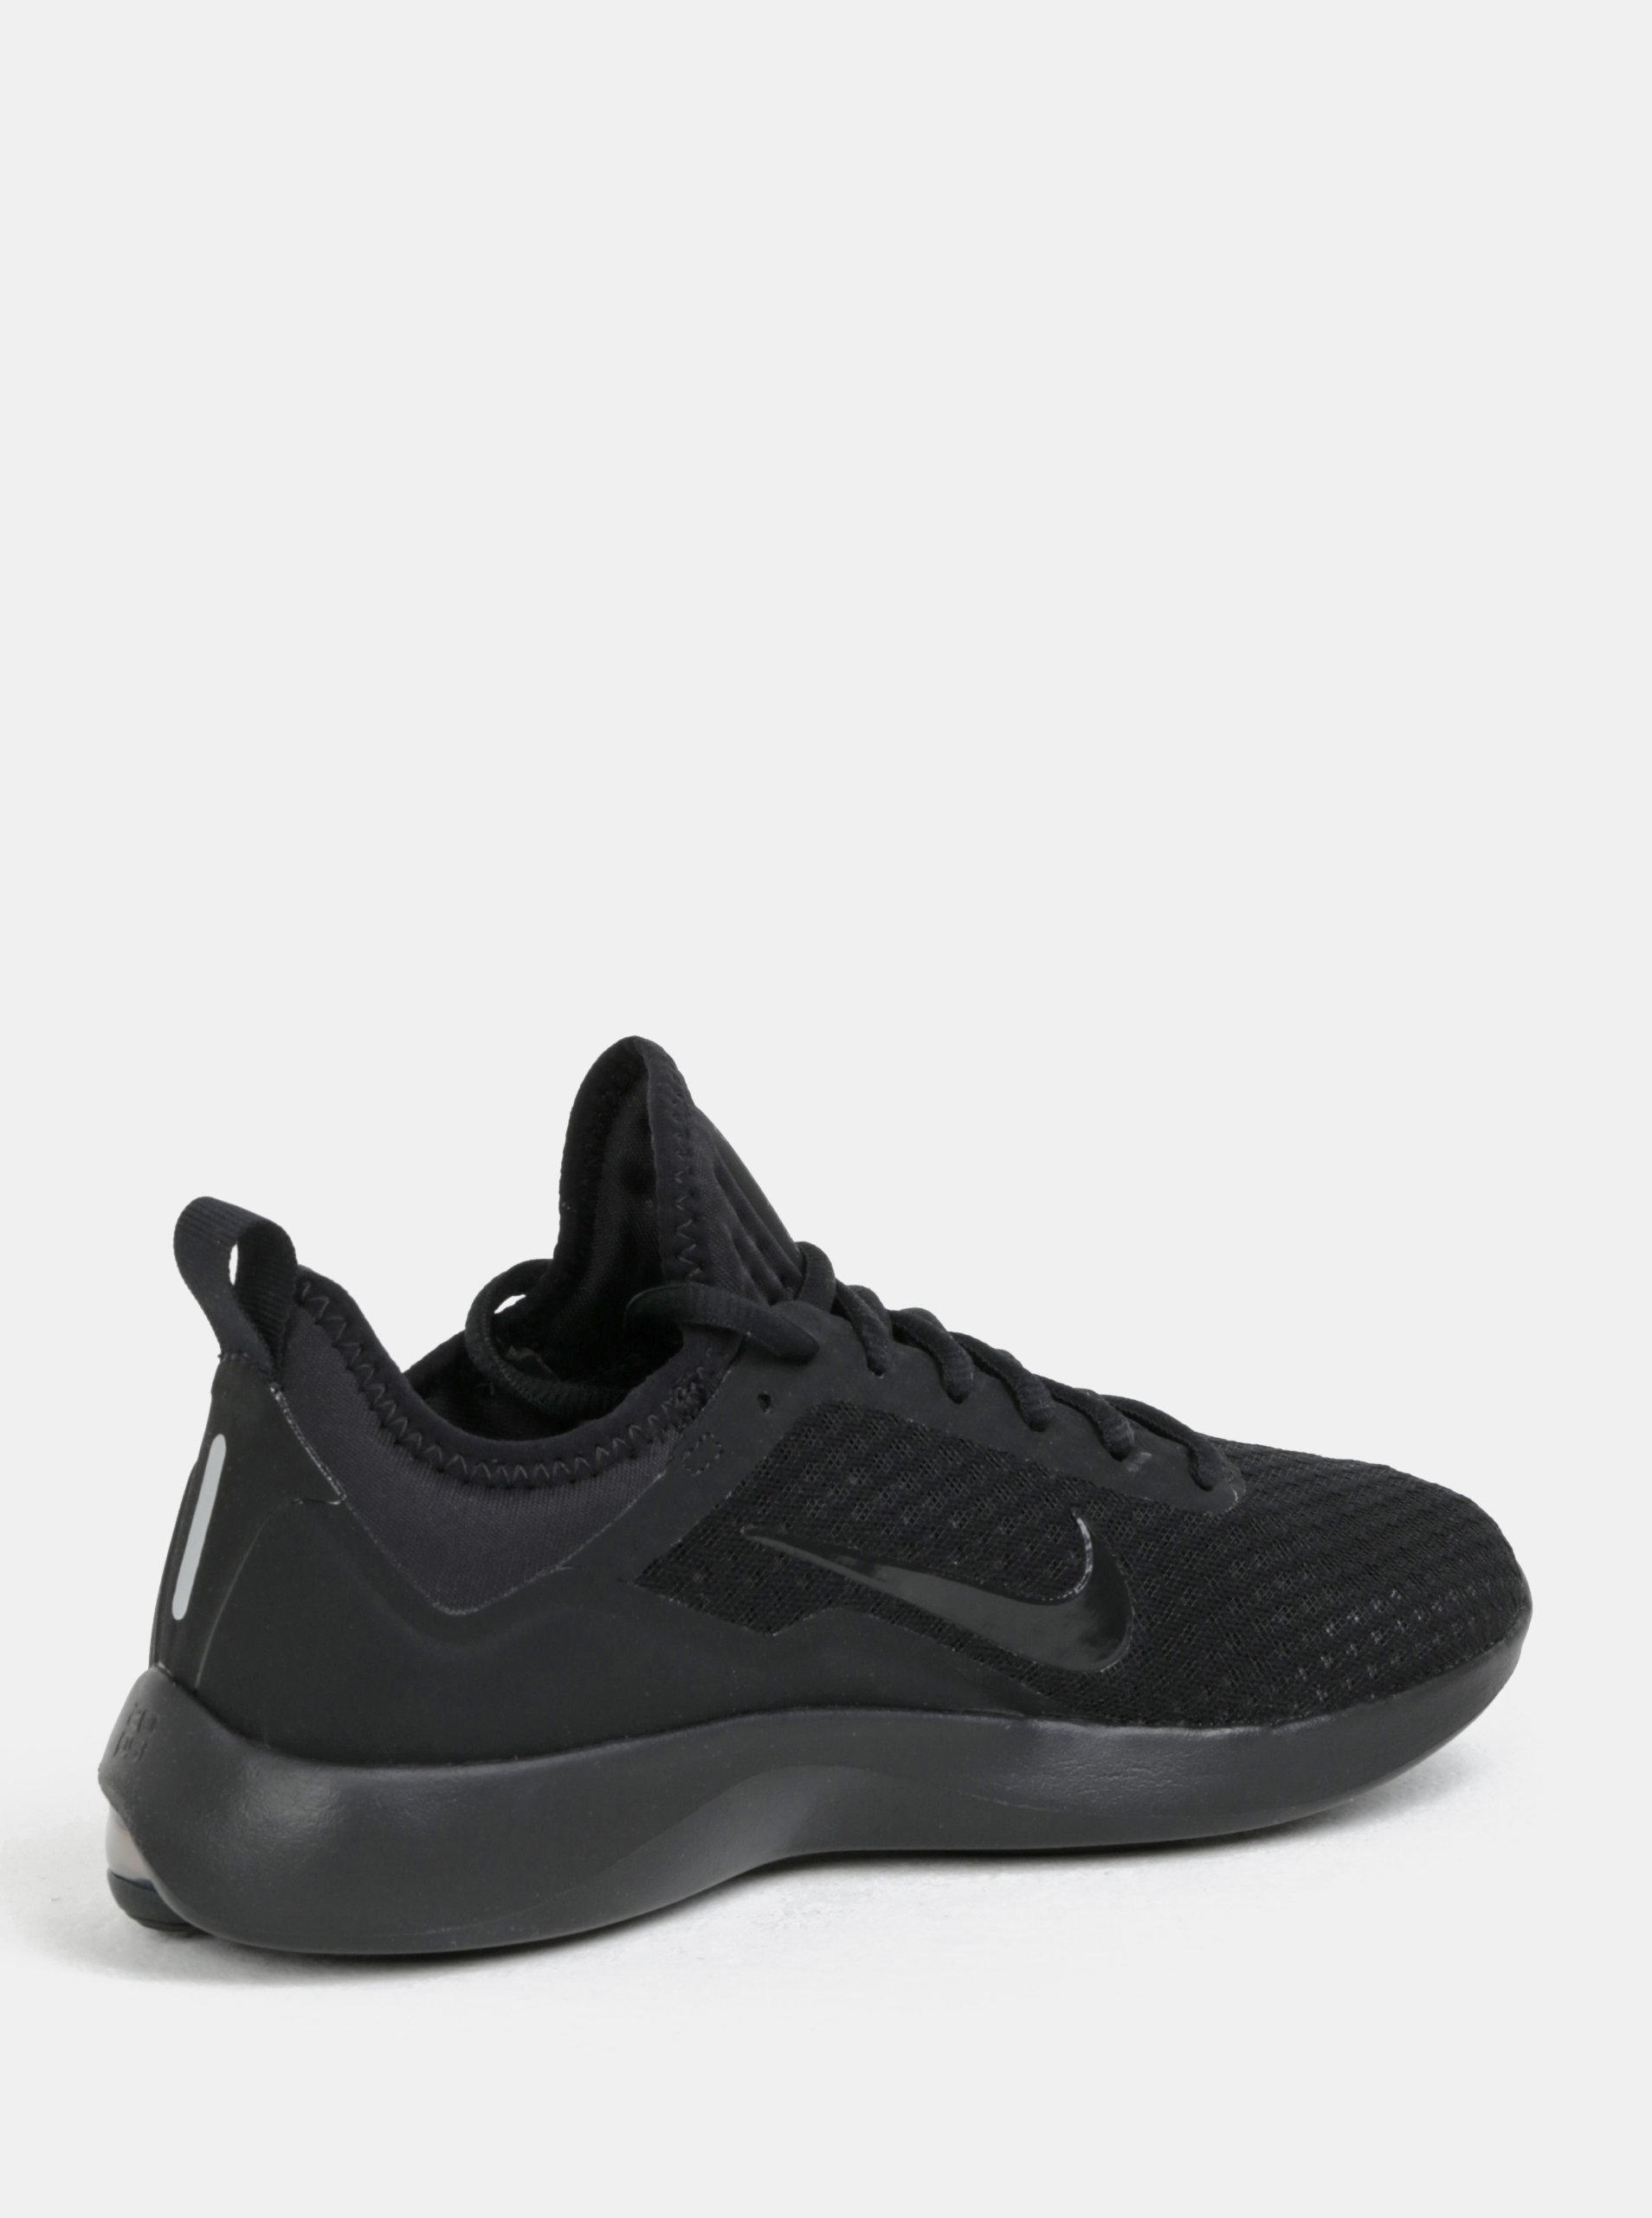 Čierne dámske tenisky Nike Air Max Kantara ... ca69d3f678b